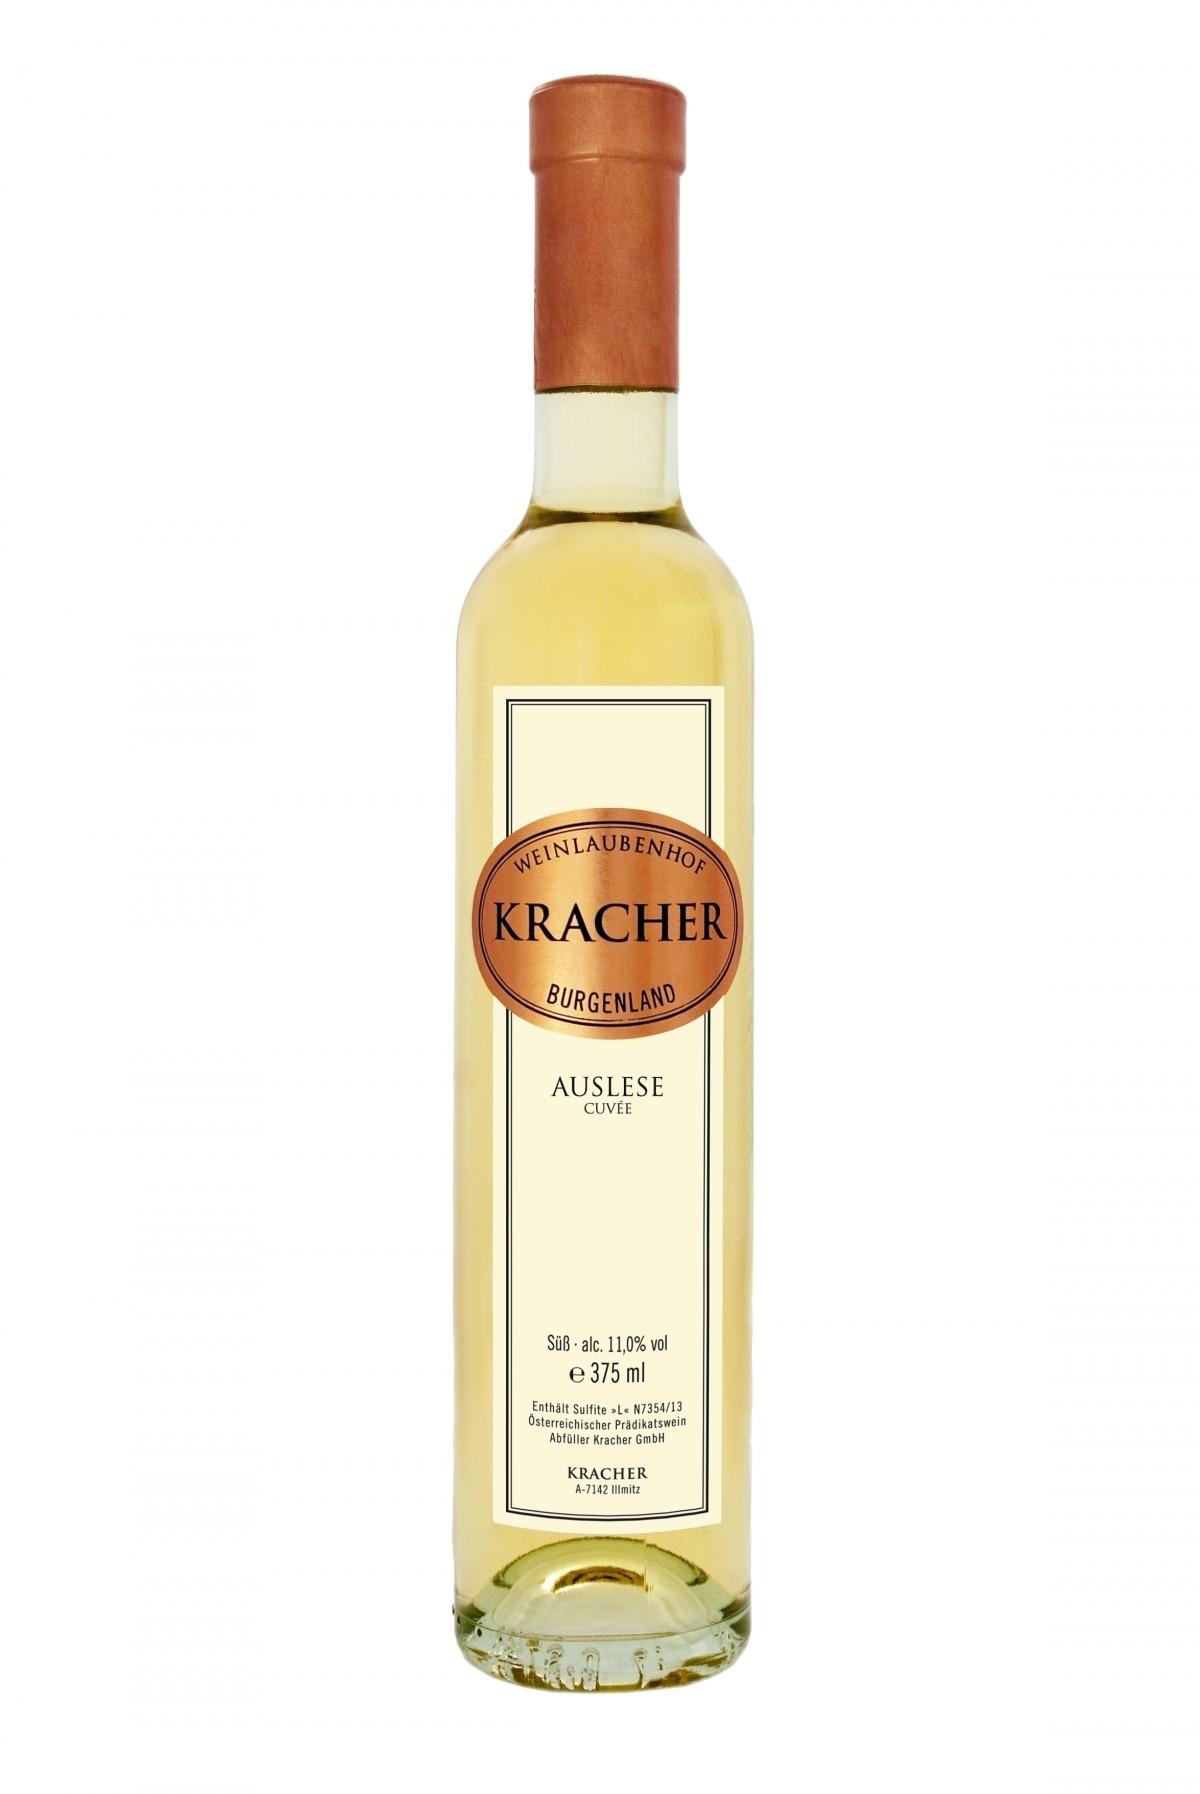 Kracher - Auslese Cuvée, 2017